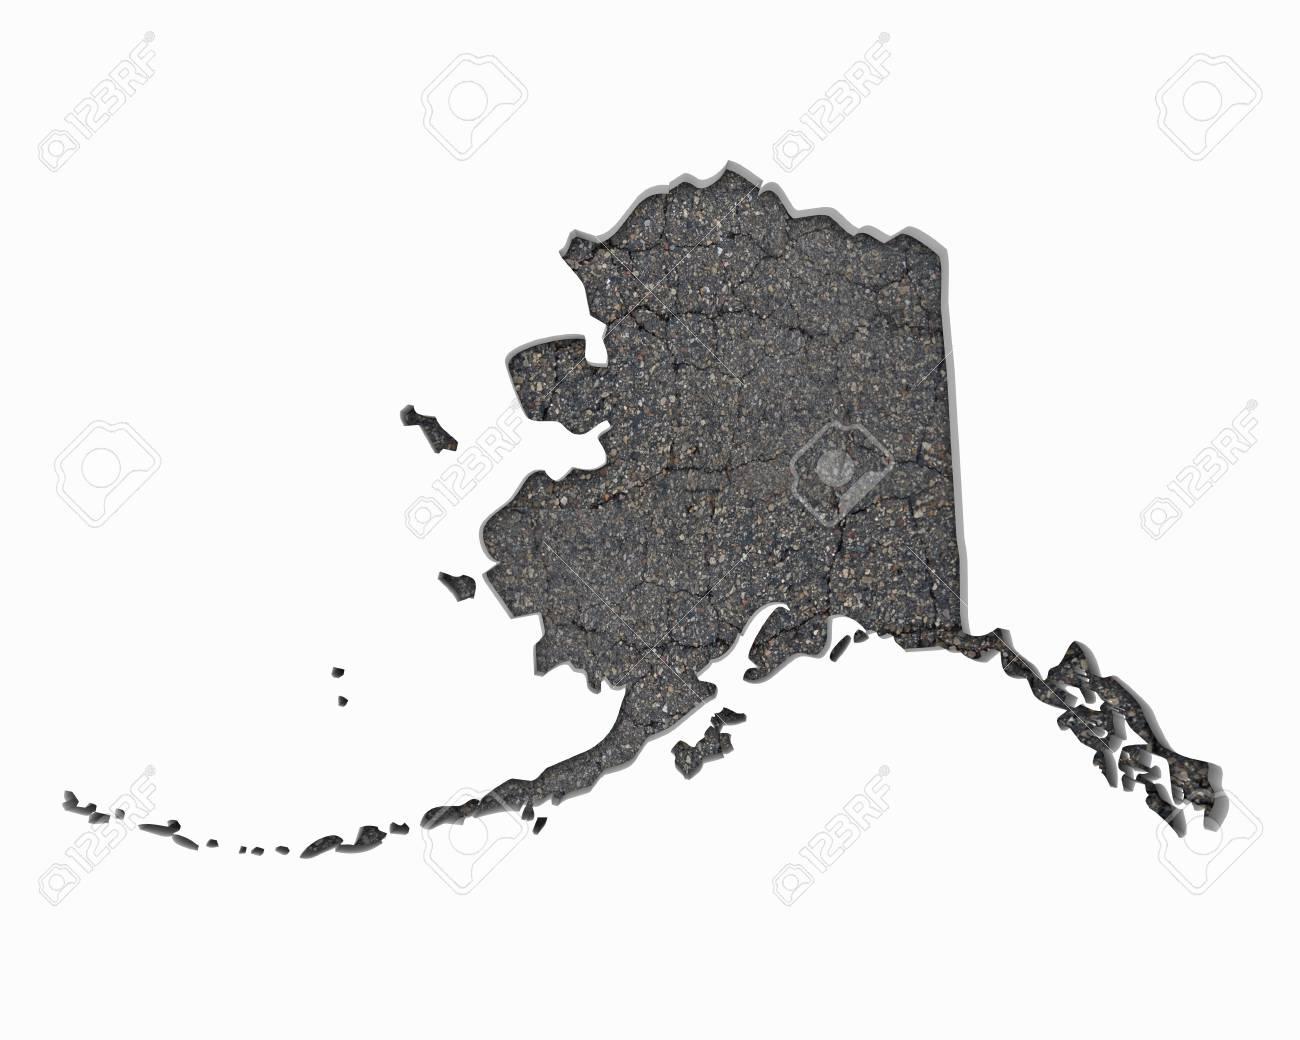 Alaska AK Road Map Pavement Construction Infrastructure 3d ...